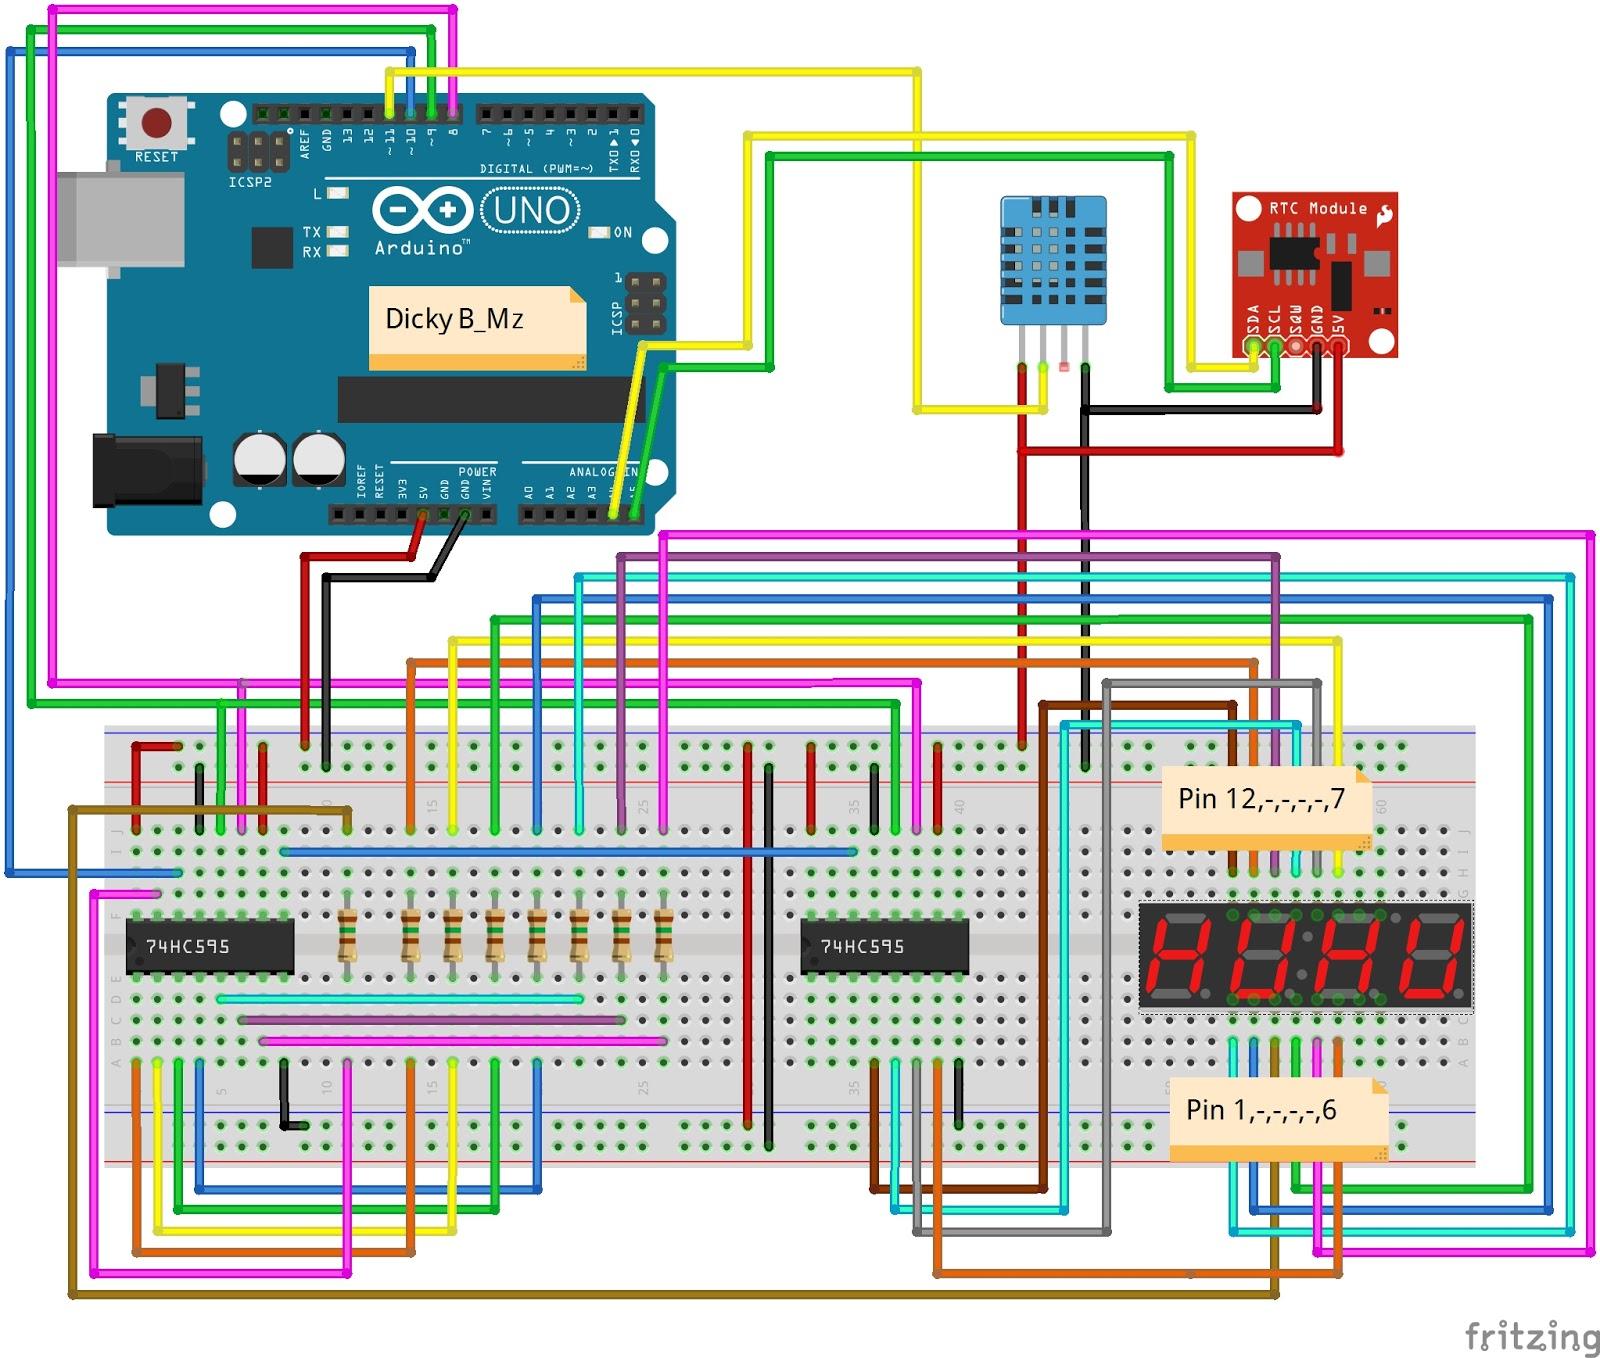 Jam Digital Arduino RTC 7 Segment + Temperature - Dicky B_Mz